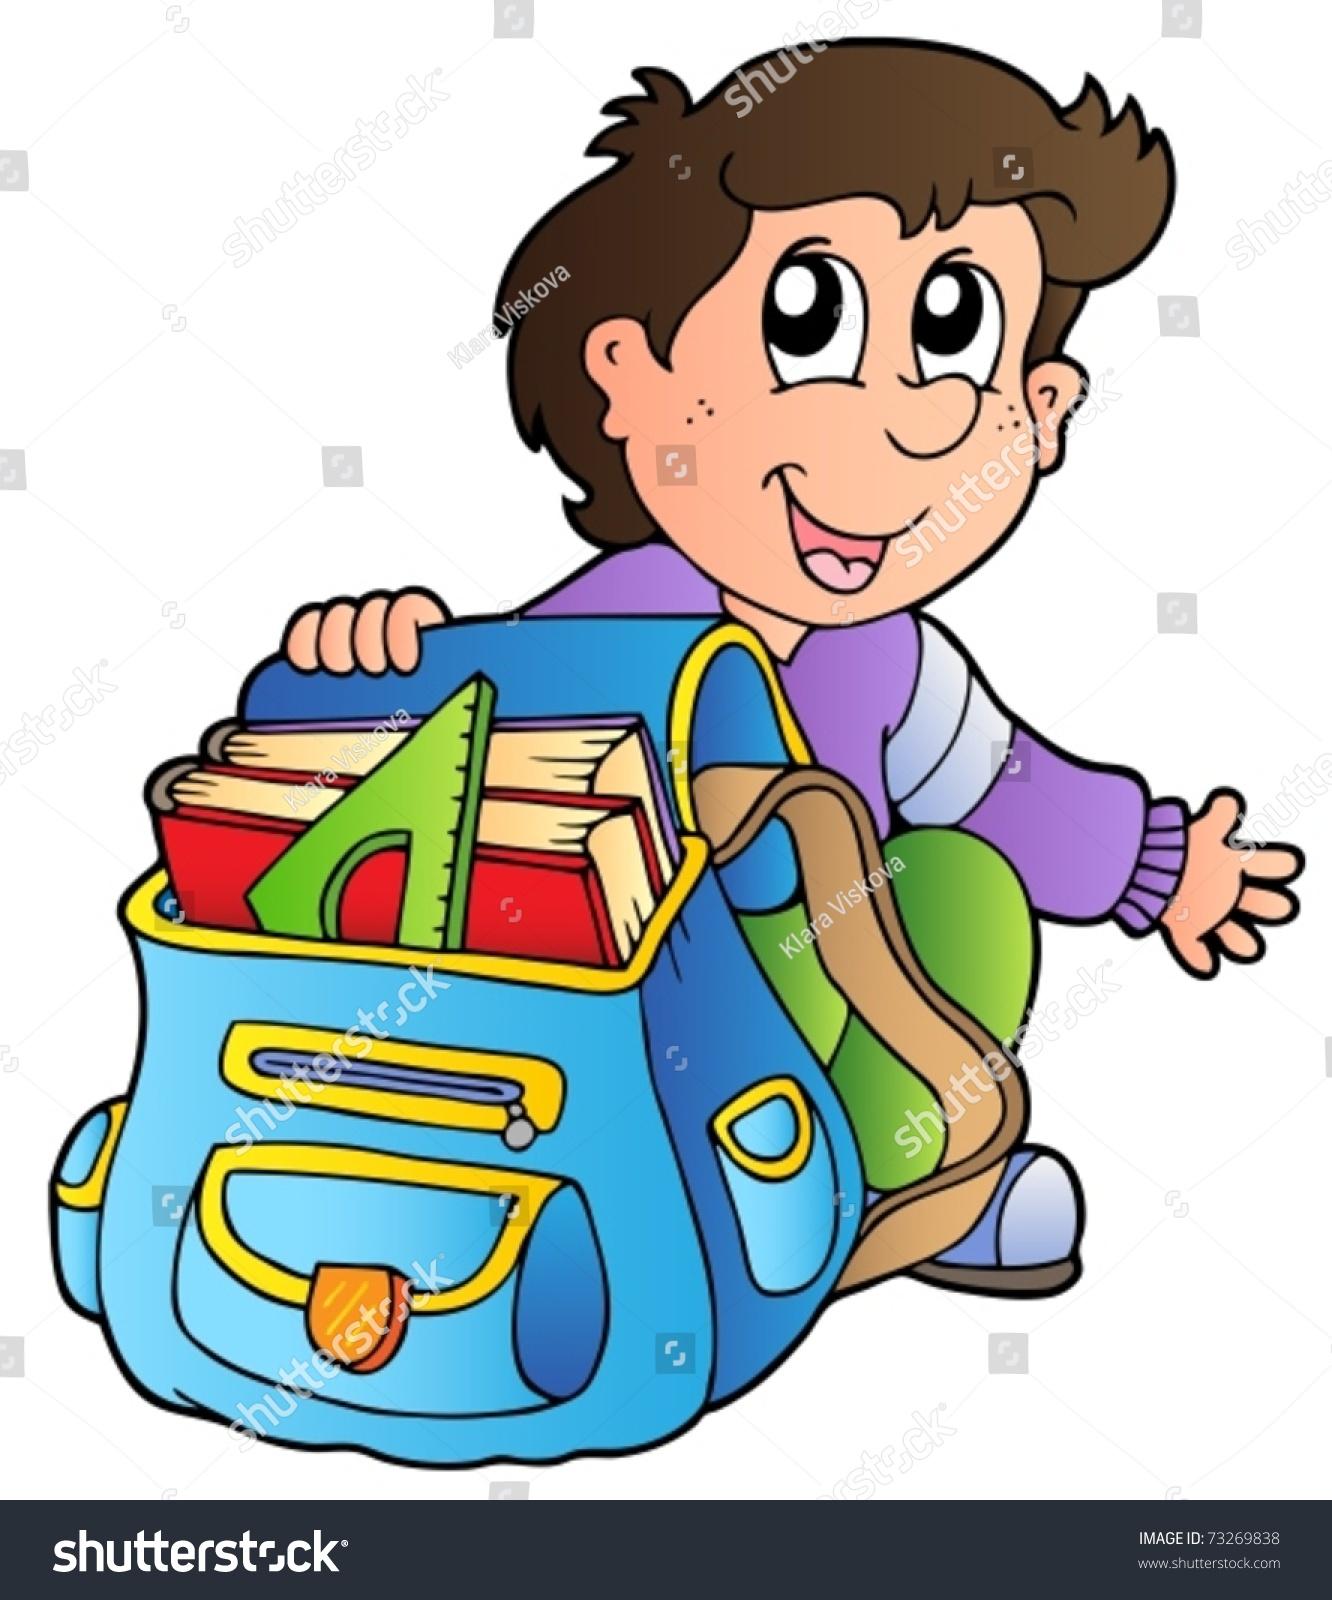 School clipart kids unpacking png free Unpack school bag clipart 3 » Clipart Station png free